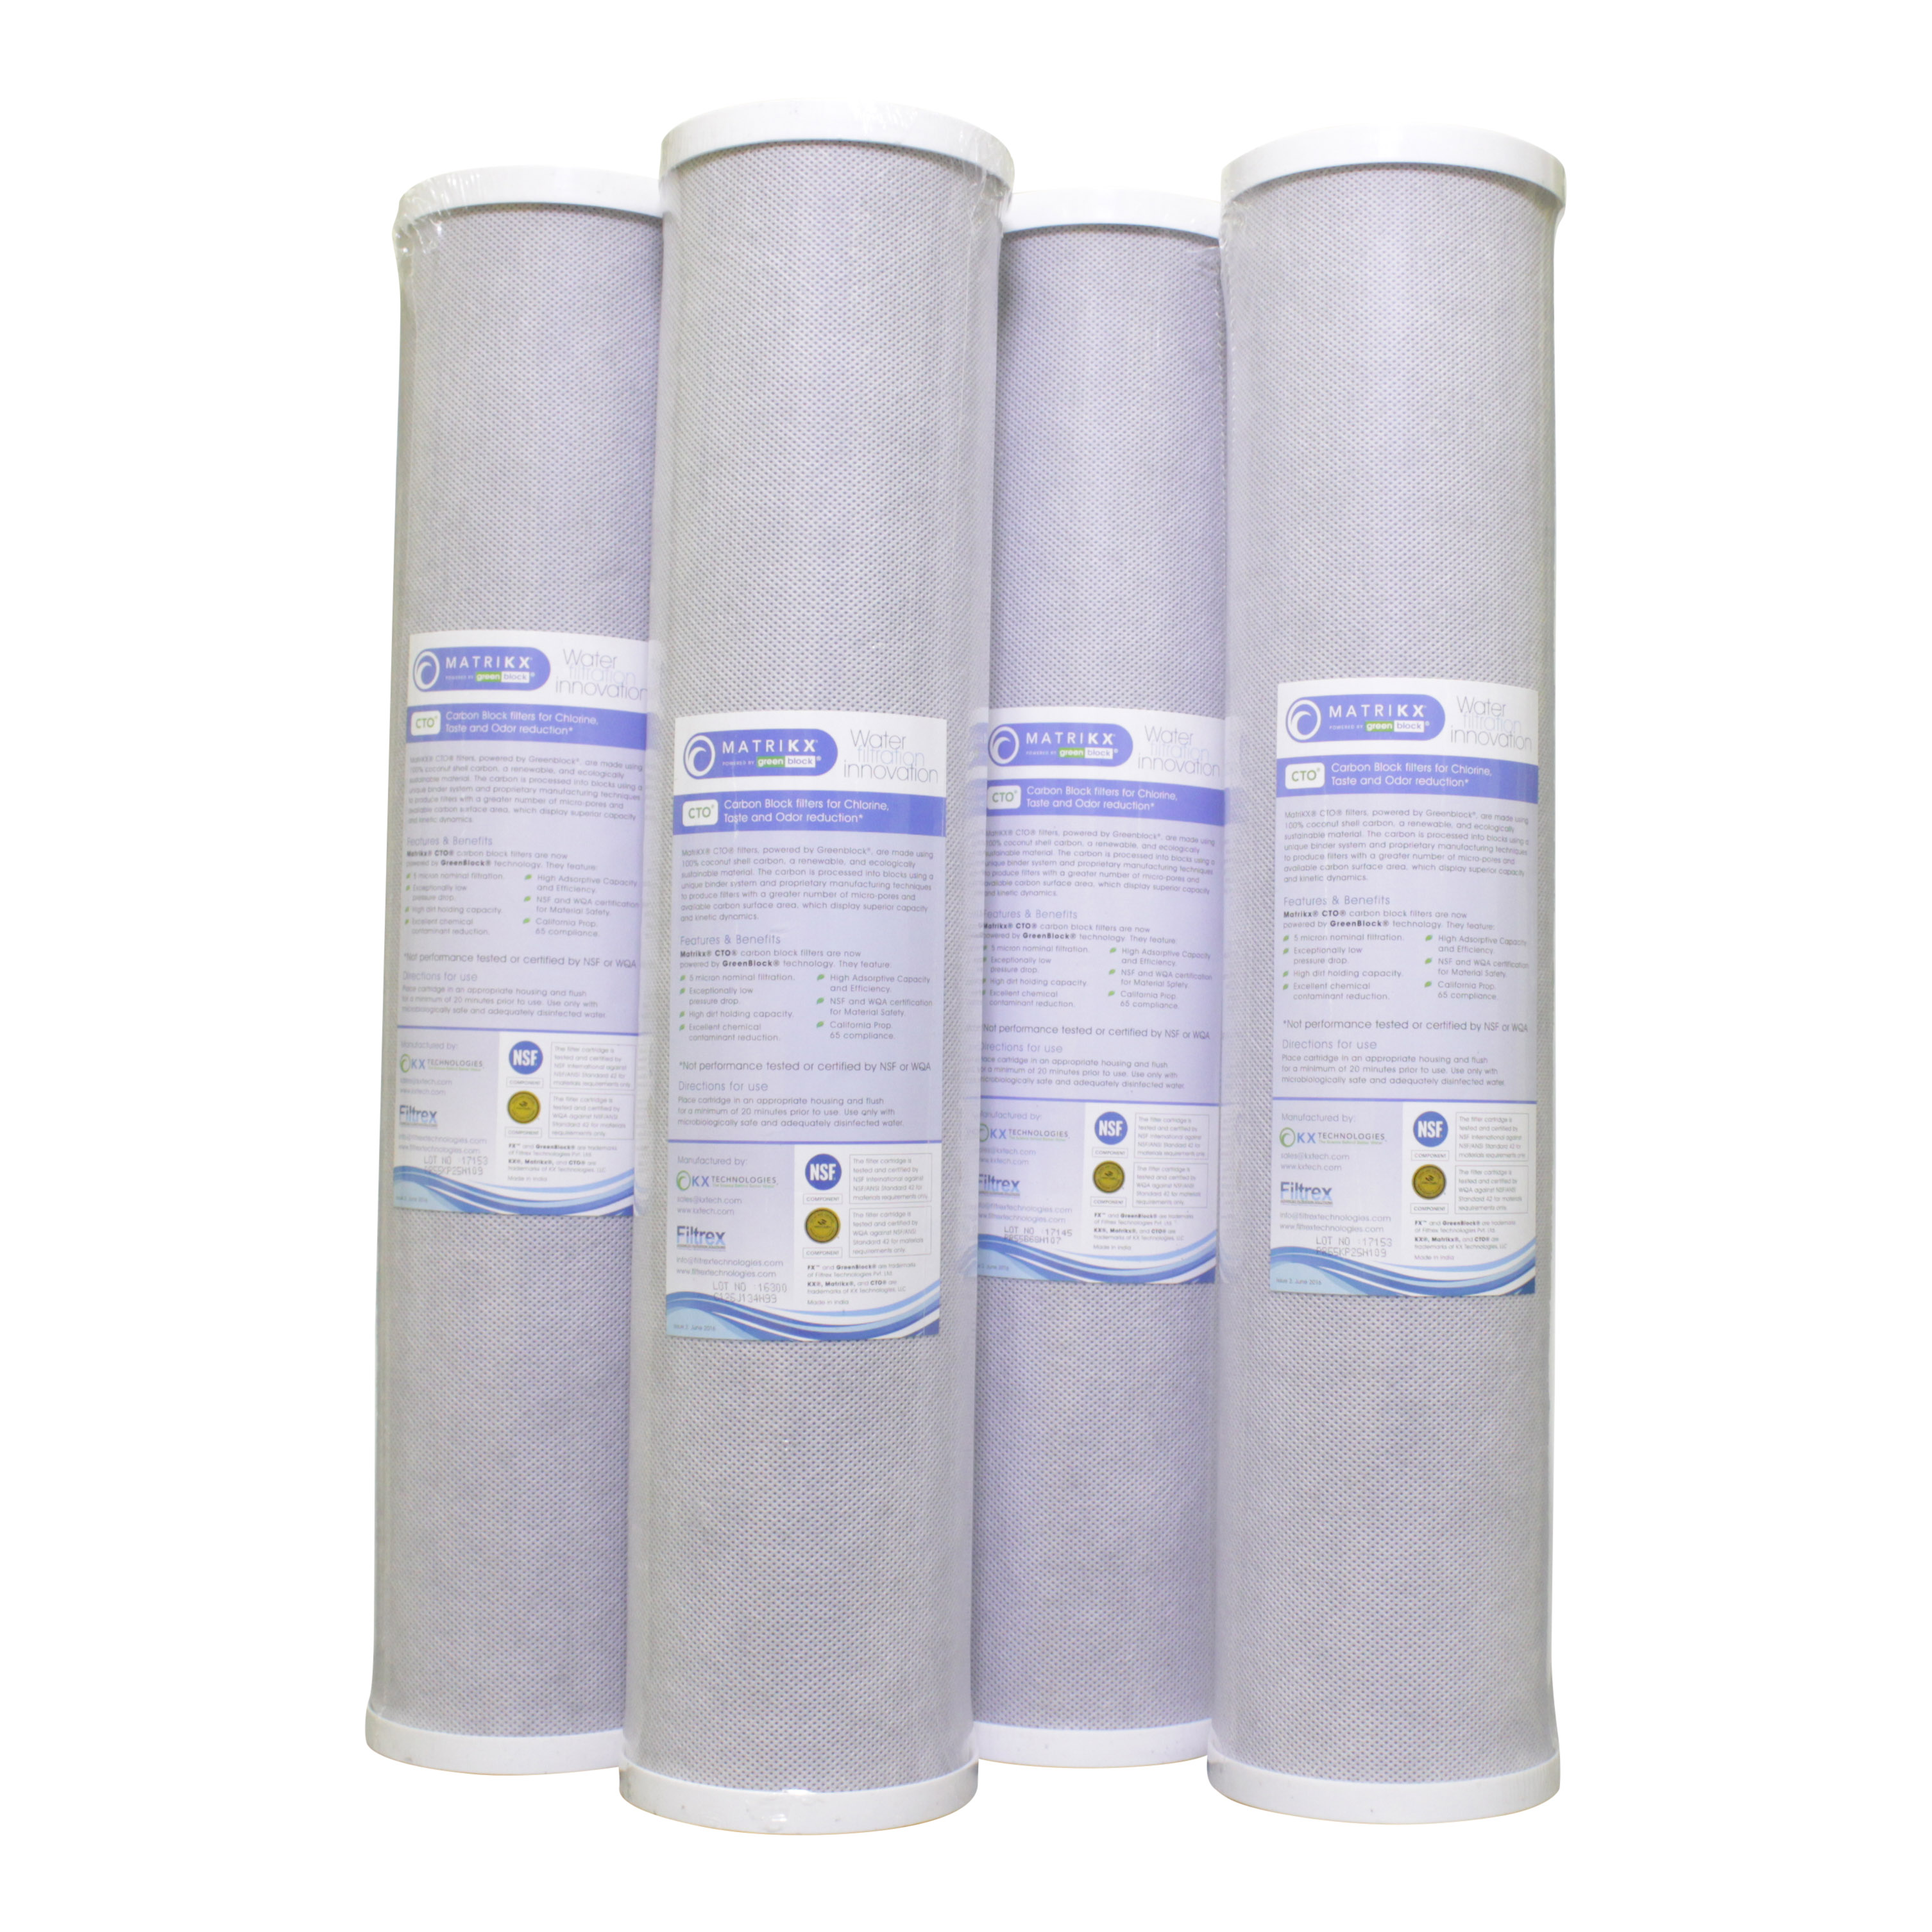 Matrikx Carbon Filters